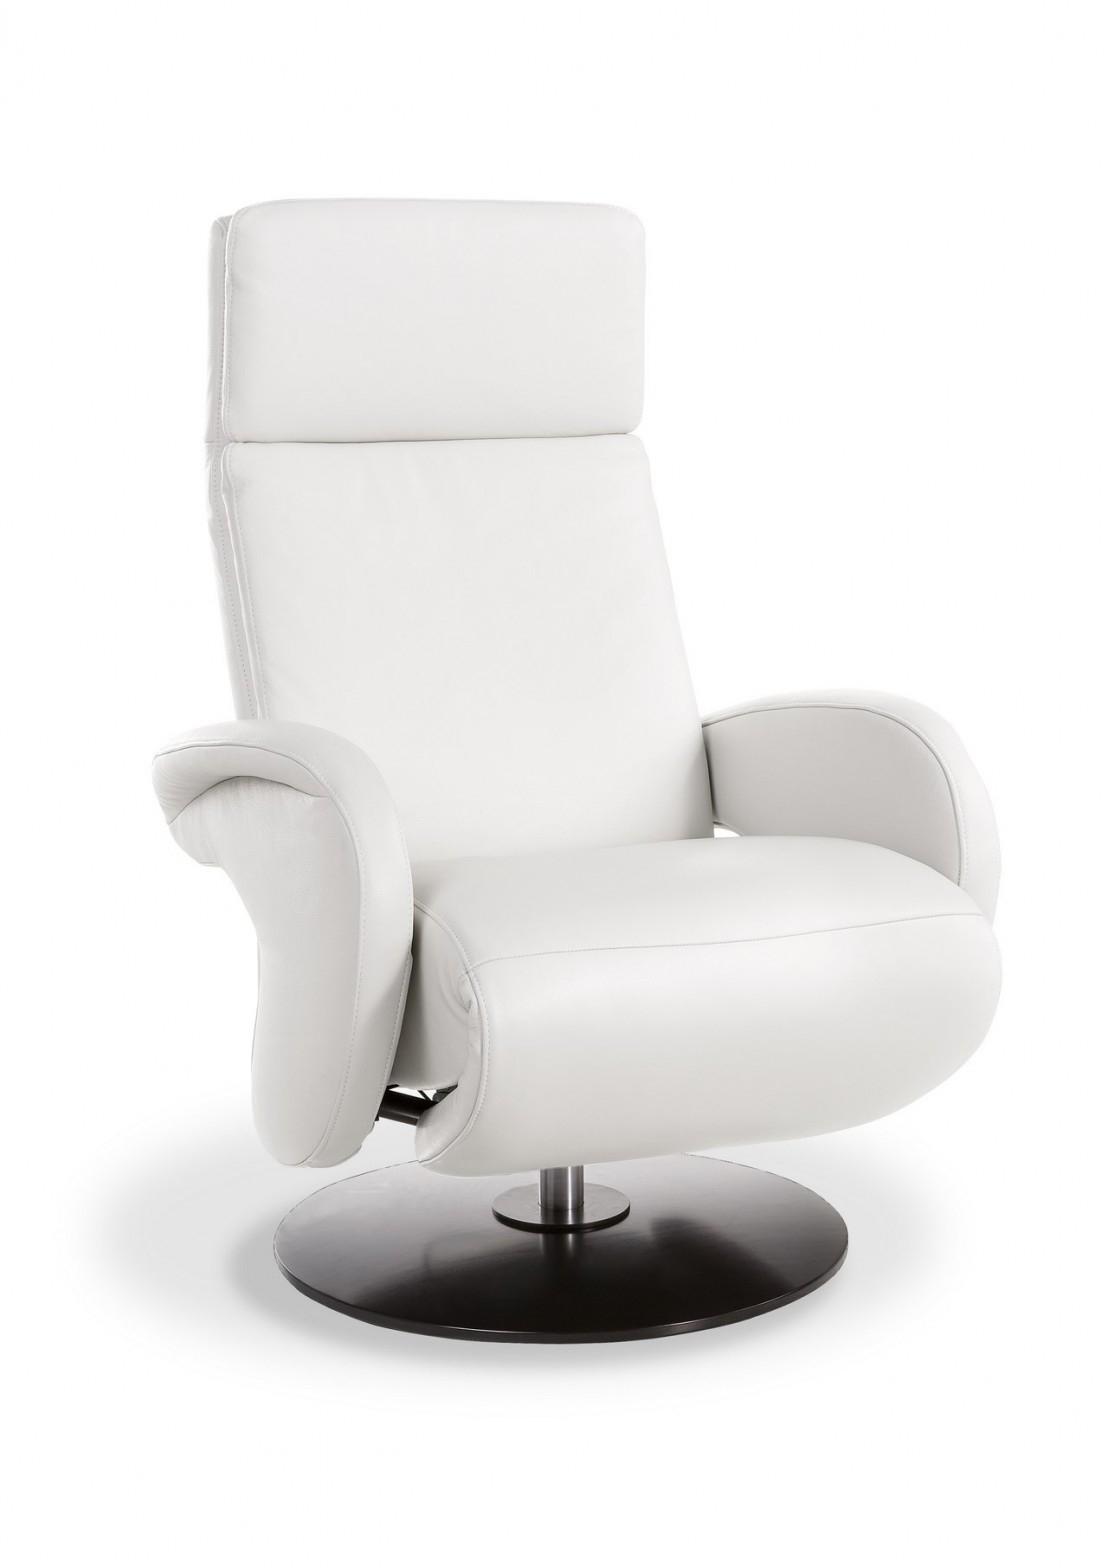 SuperPrince fauteuil cuir relax design